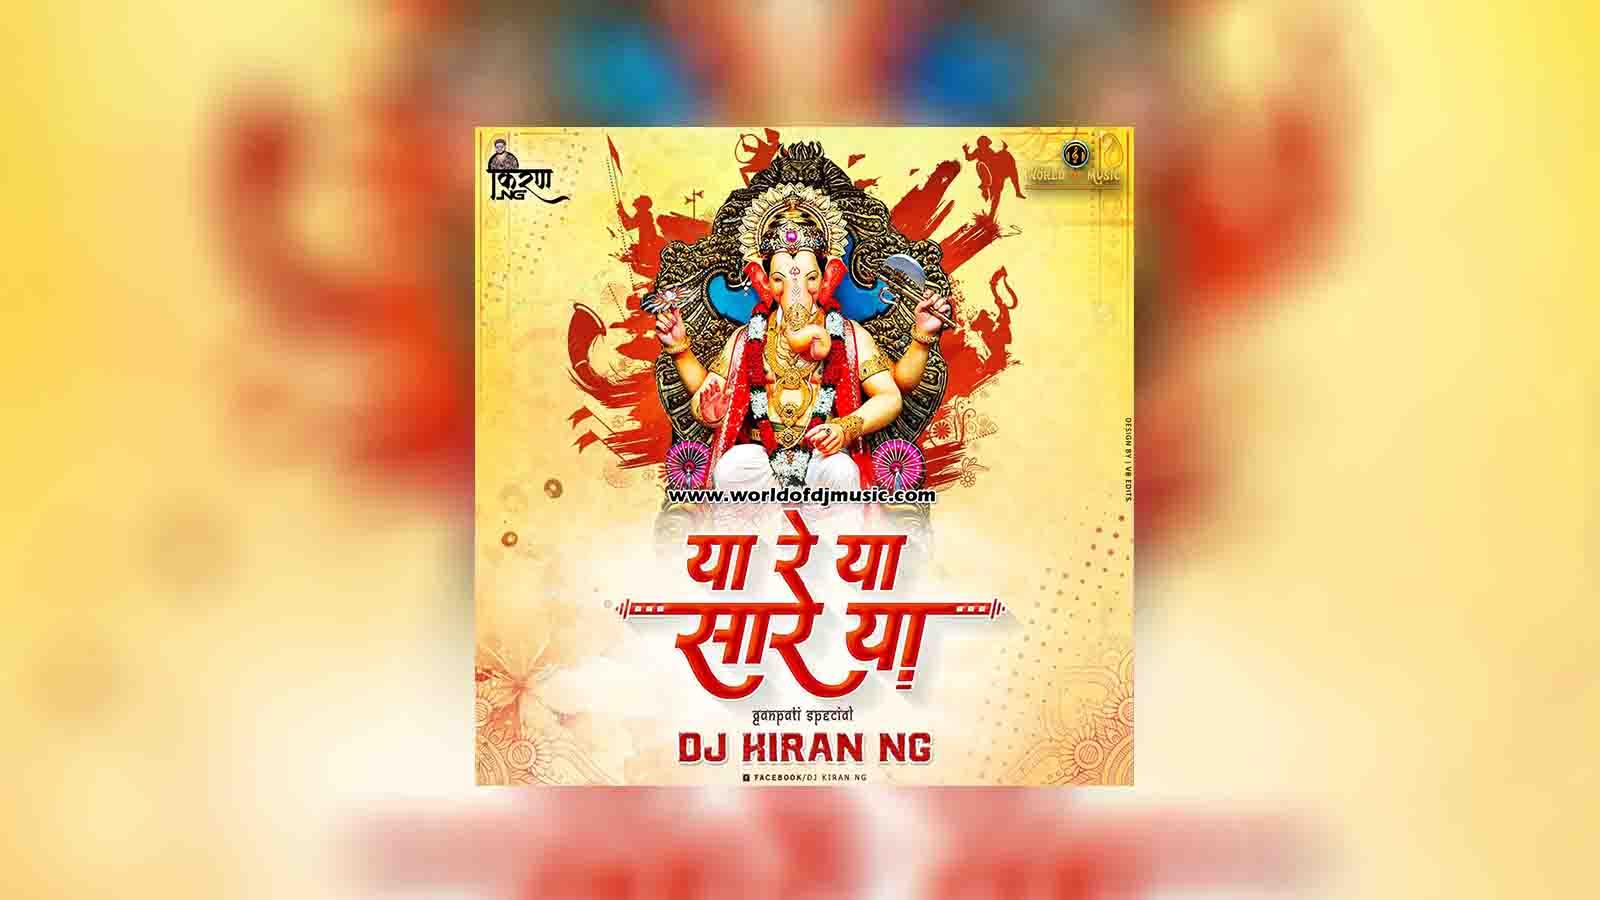 Ya Re Ya Saare Ya (Ganpati Special) - Dj Kiran NG